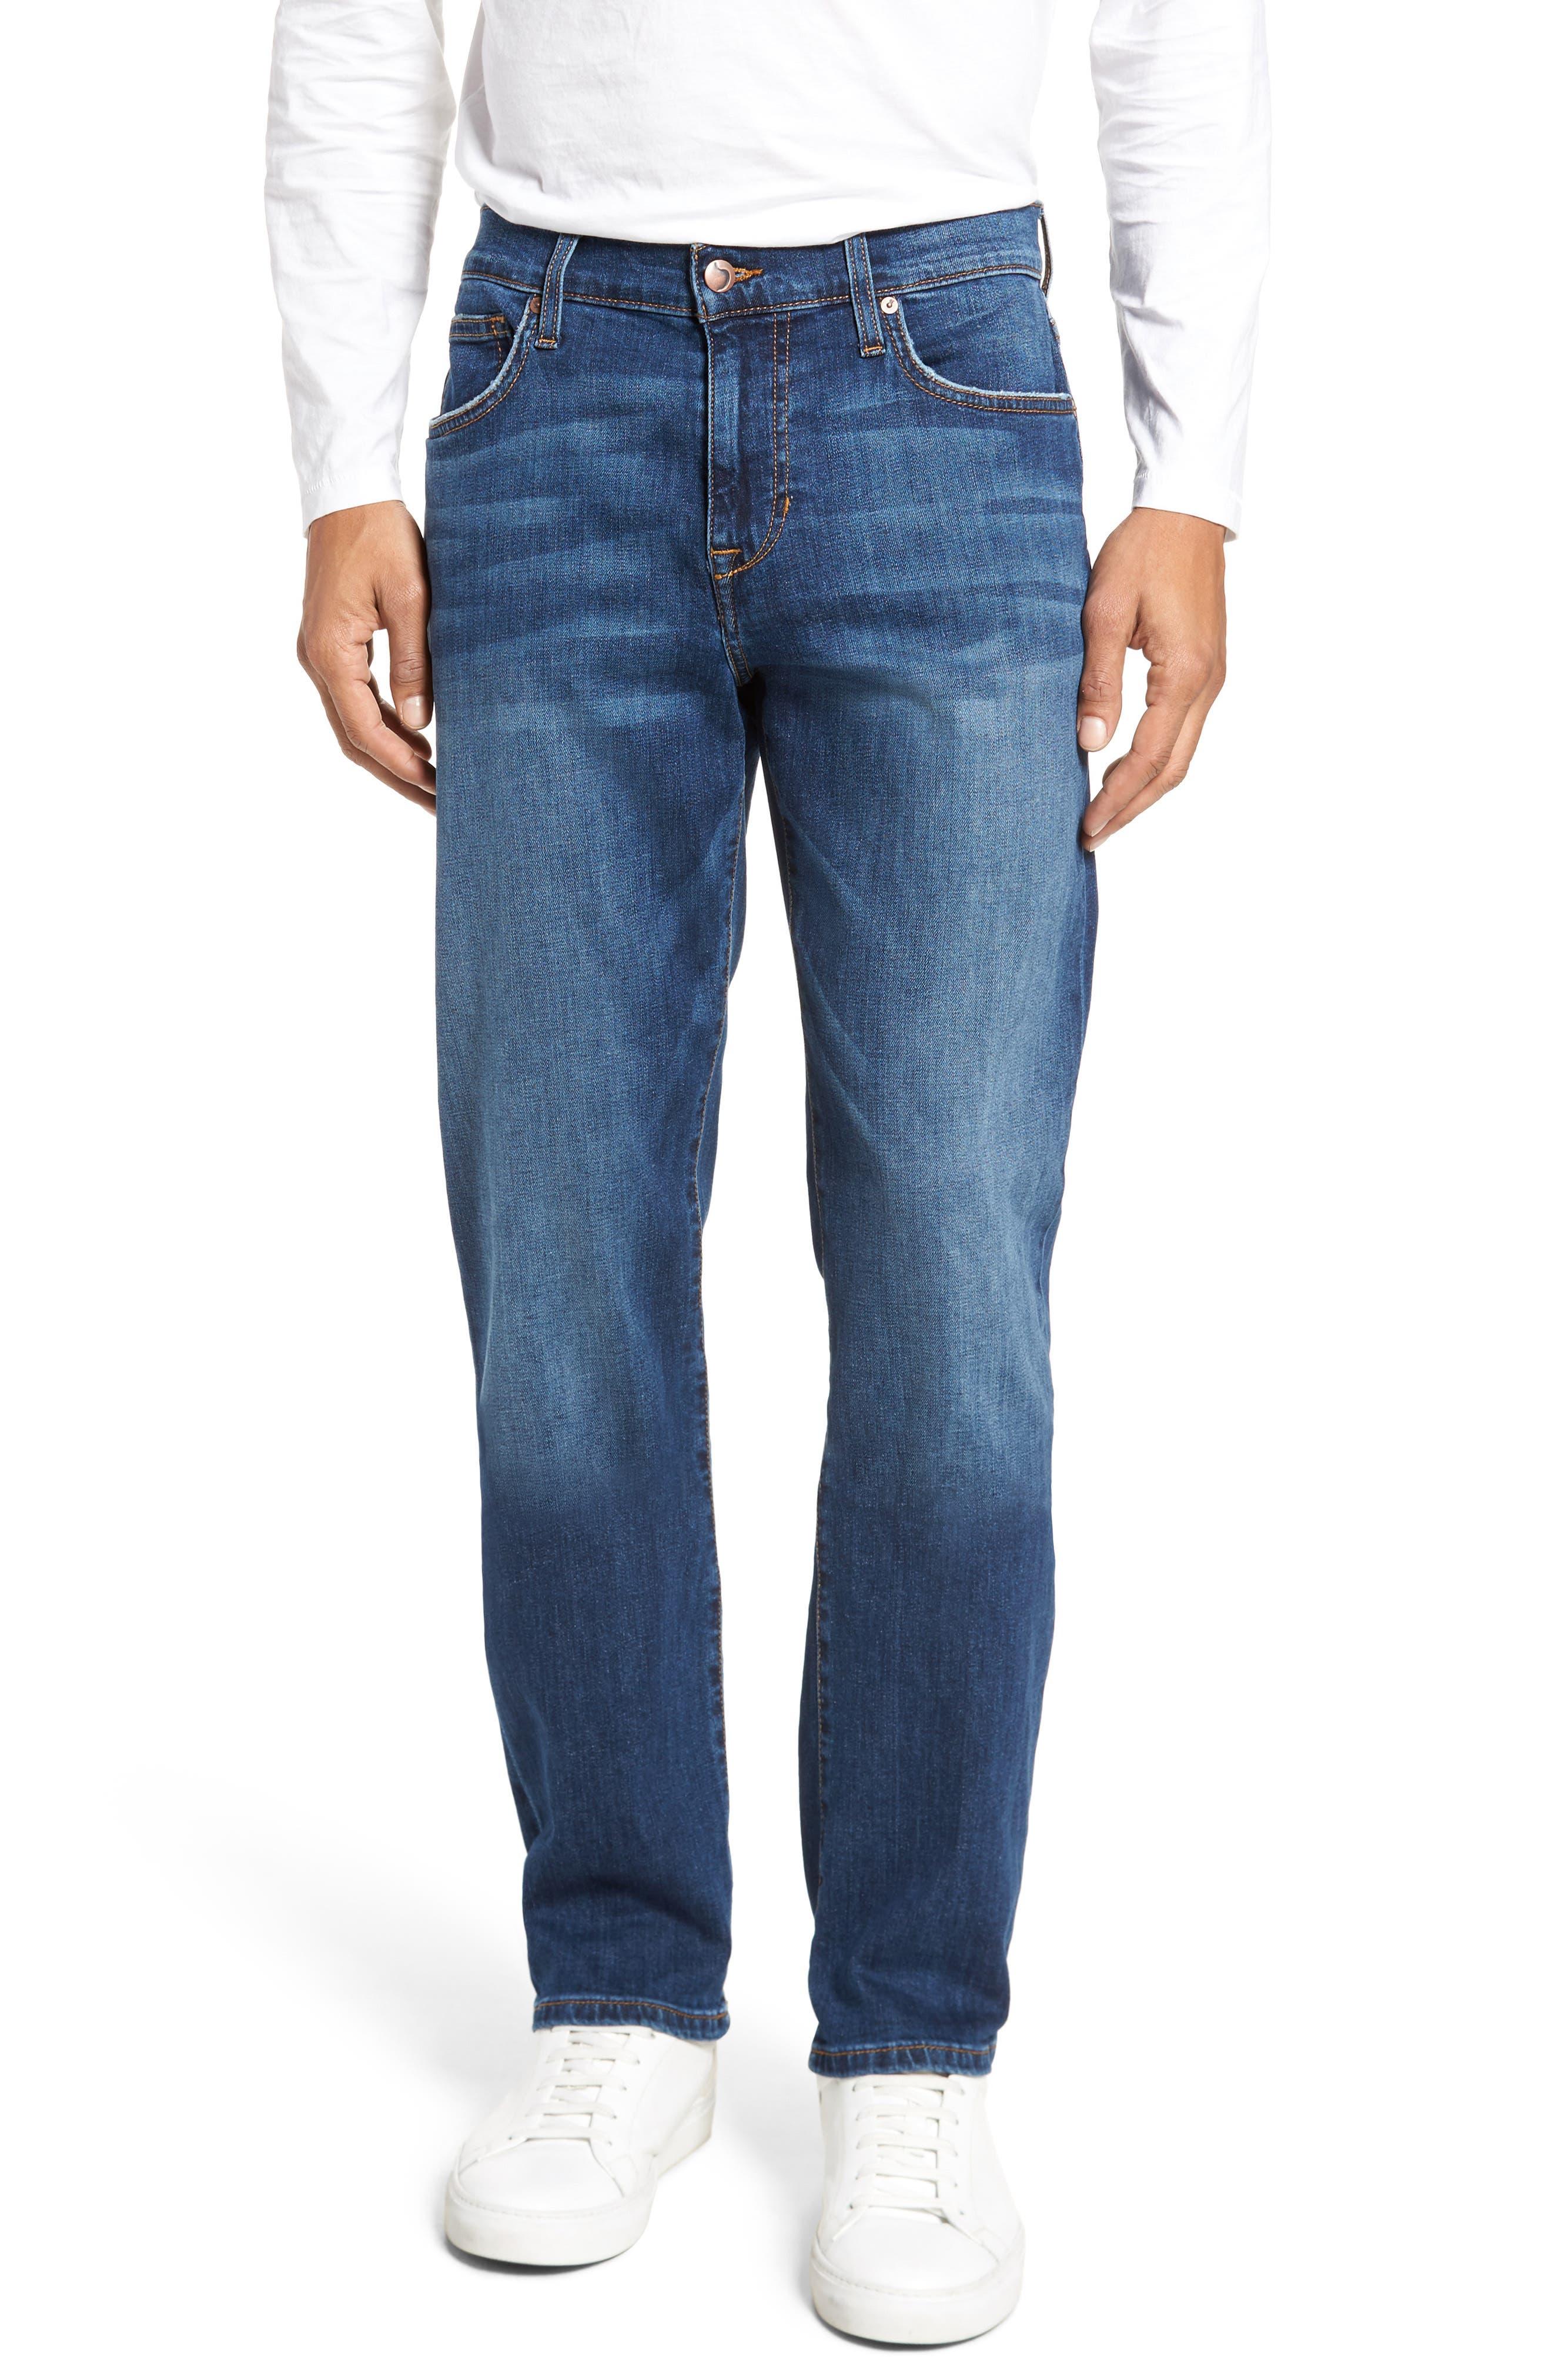 Alternate Image 1 Selected - Joe's Brixton Slim Straight Fit Jeans (Bradlee)